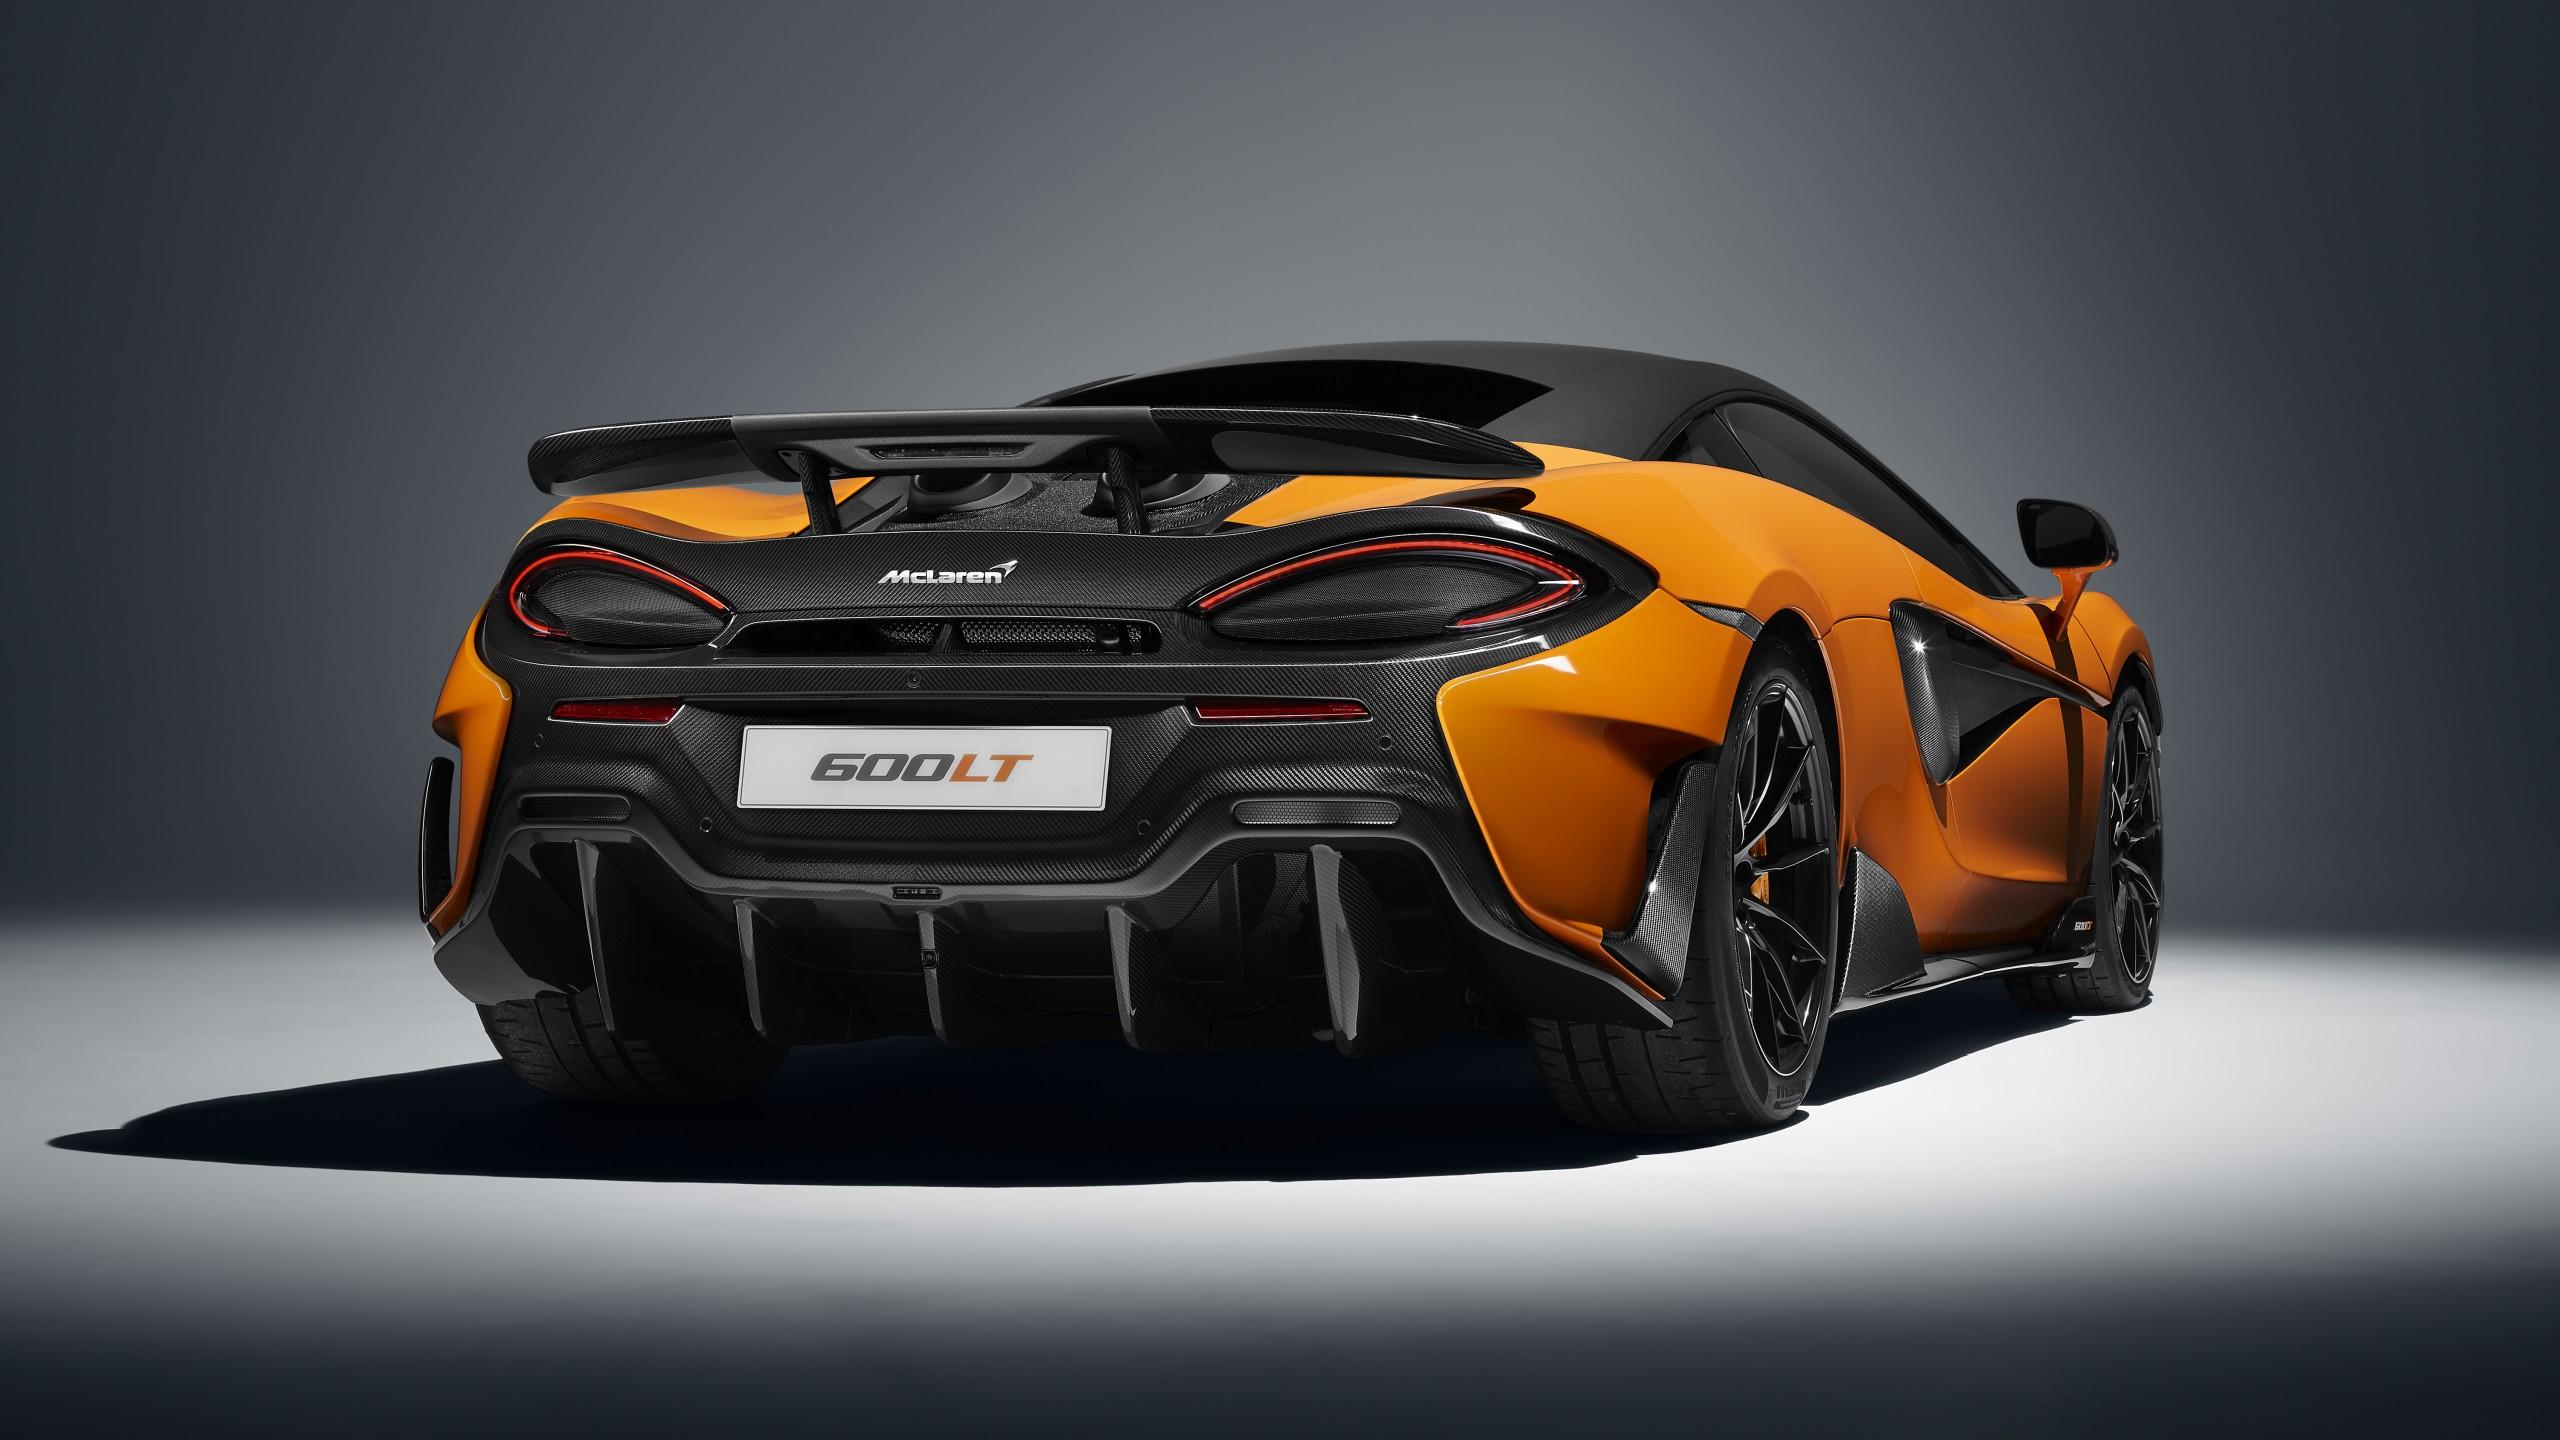 2019 McLaren 600LT 5K 6 Wallpaper | HD Car Wallpapers | ID #10834